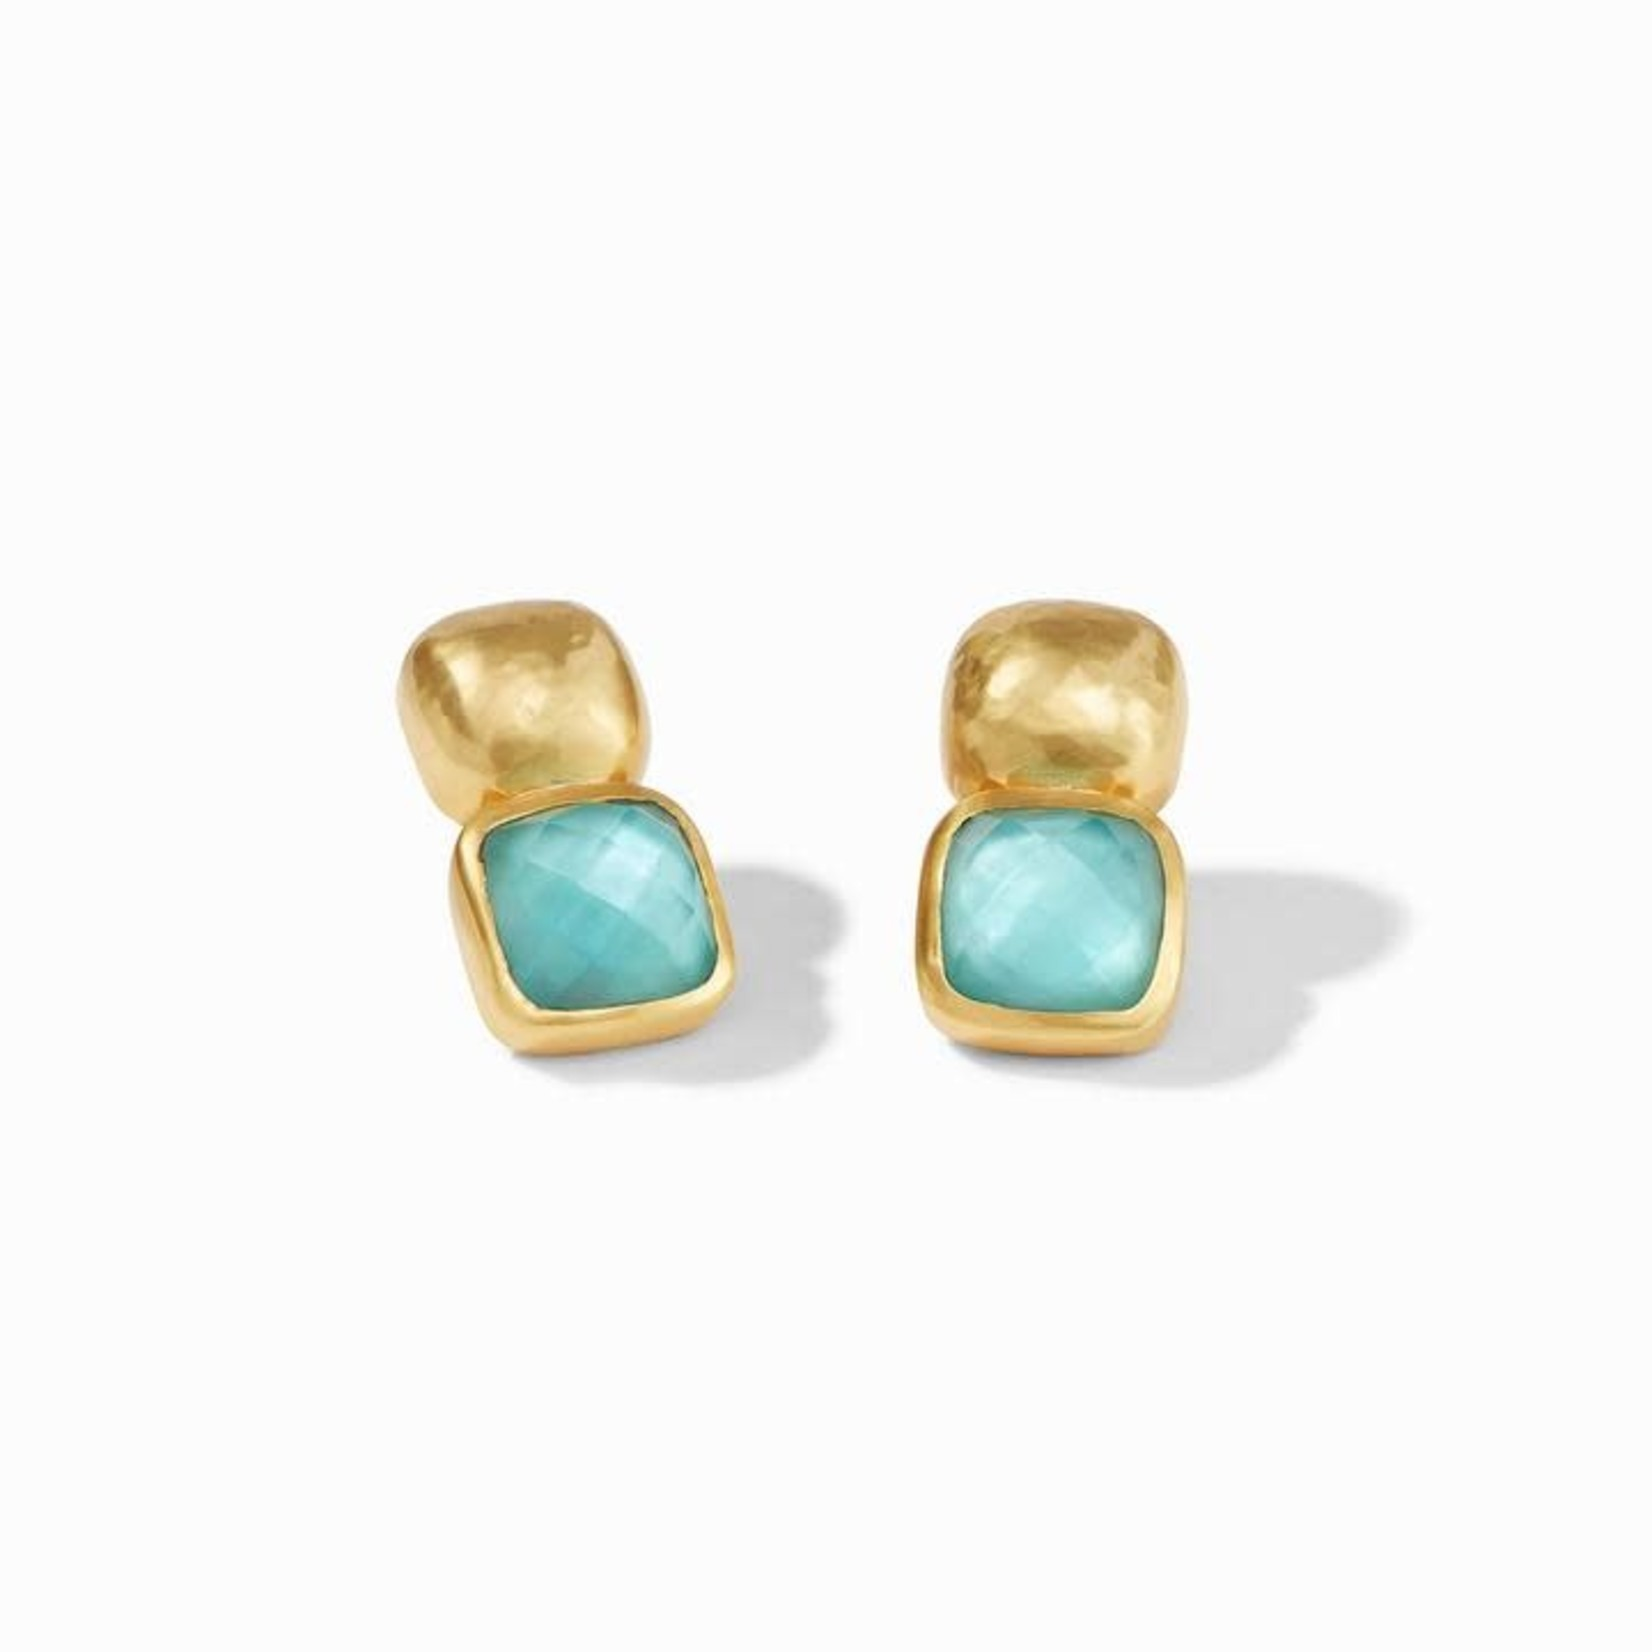 Julie Vos Catalina Earring - Iridescent Bahamian Blue